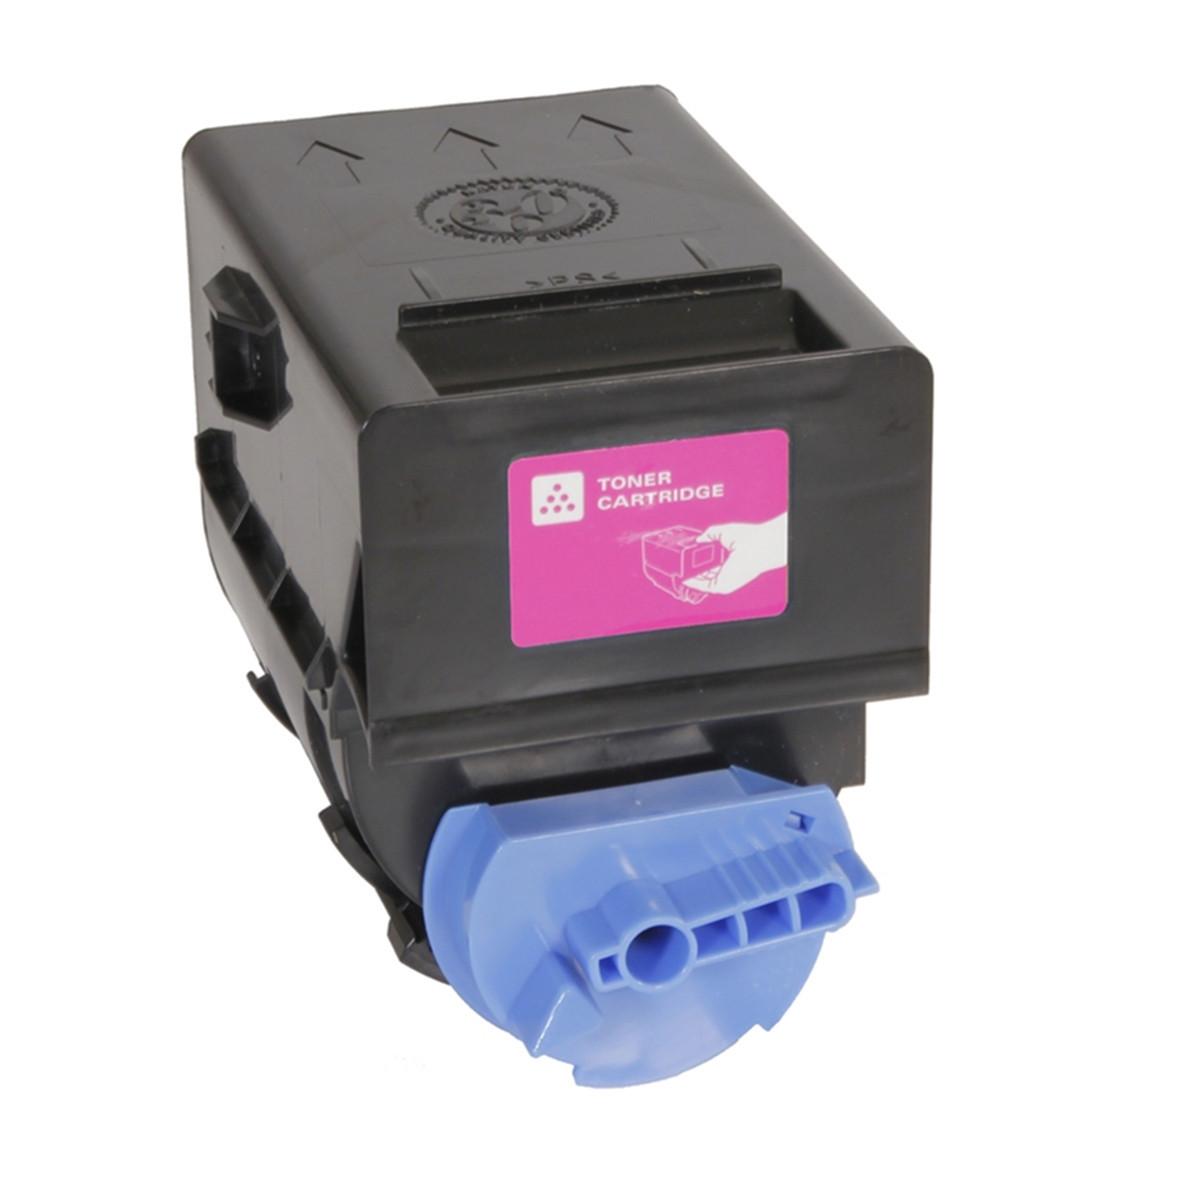 Toner Compatível com Canon GPR-23 Magenta | IMAGERUNNER C2550 C2880 C3080 C3380 | Katun Access 260g